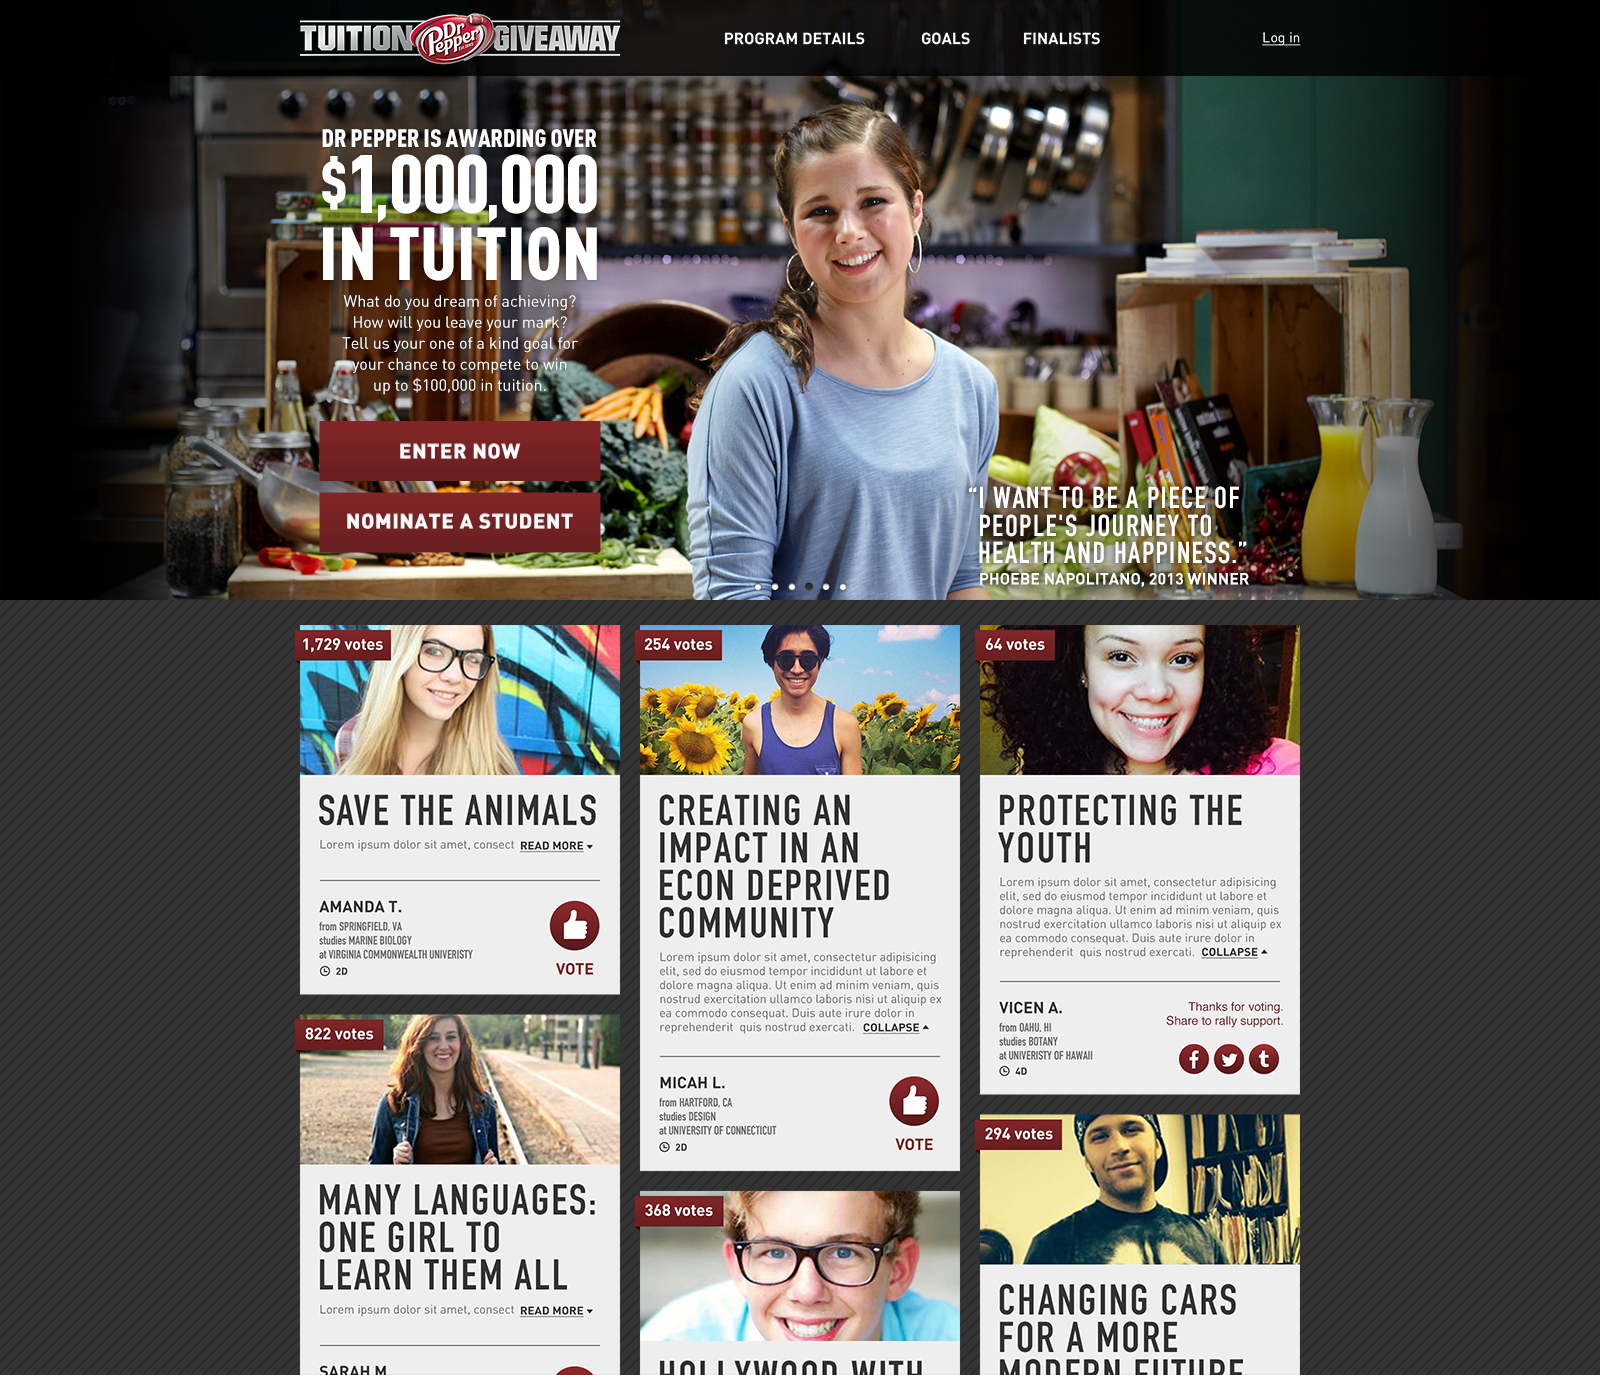 tuition3_0004_5.jpg